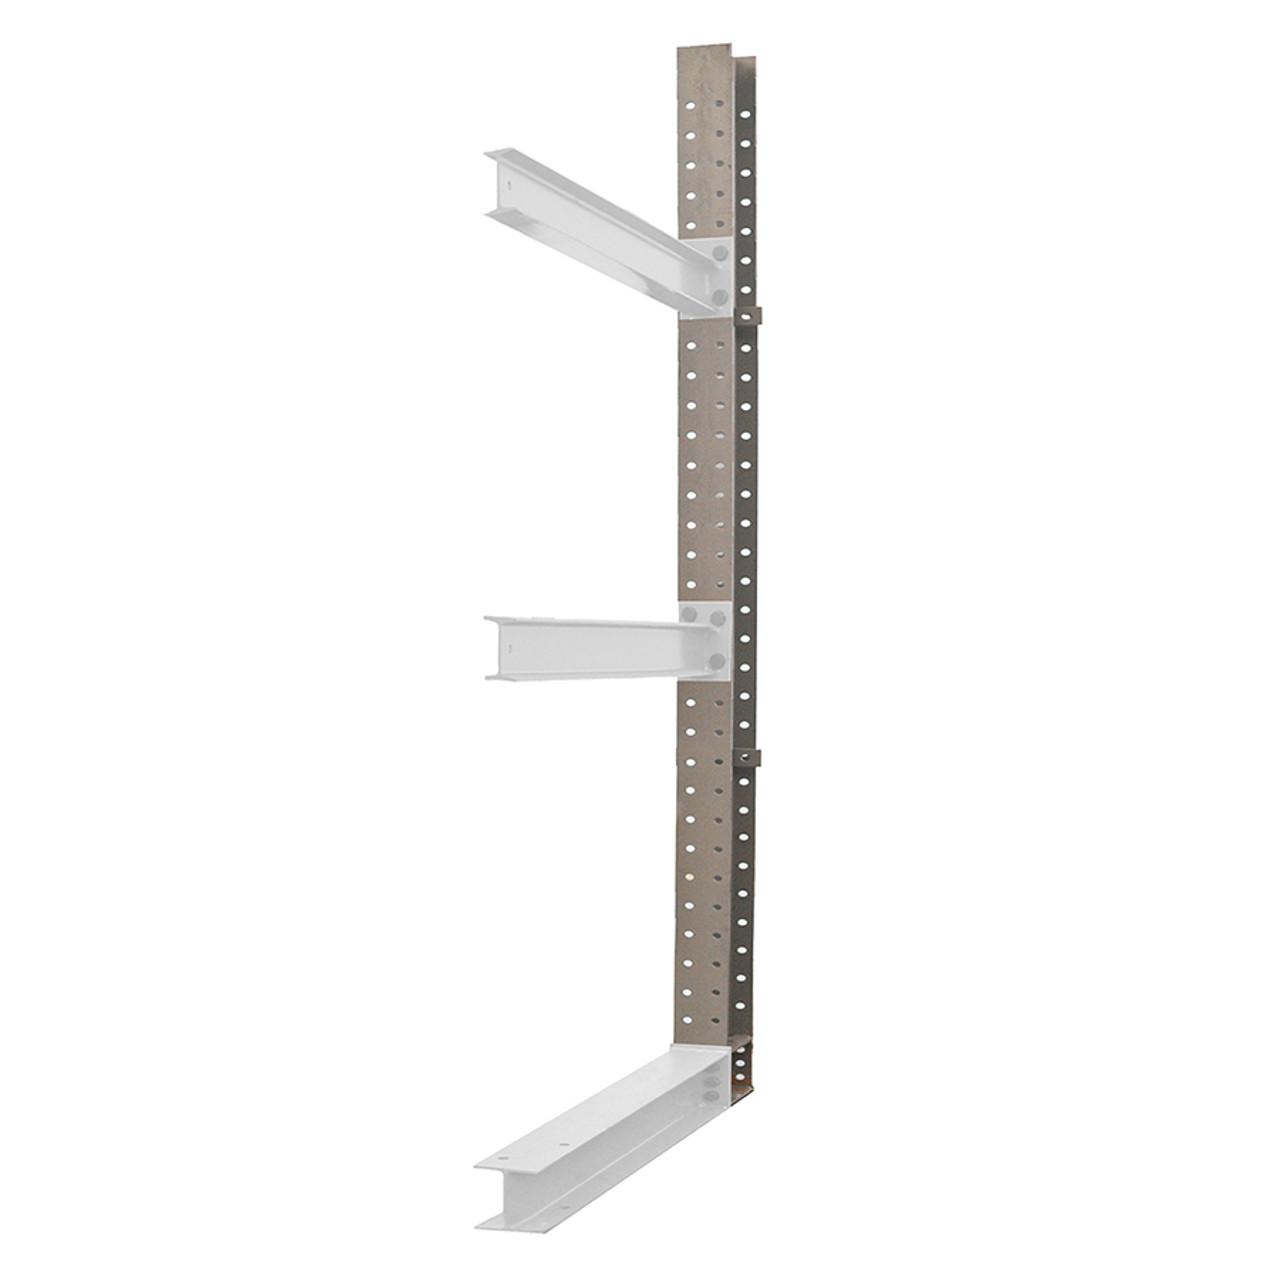 Cantilever racking upright column